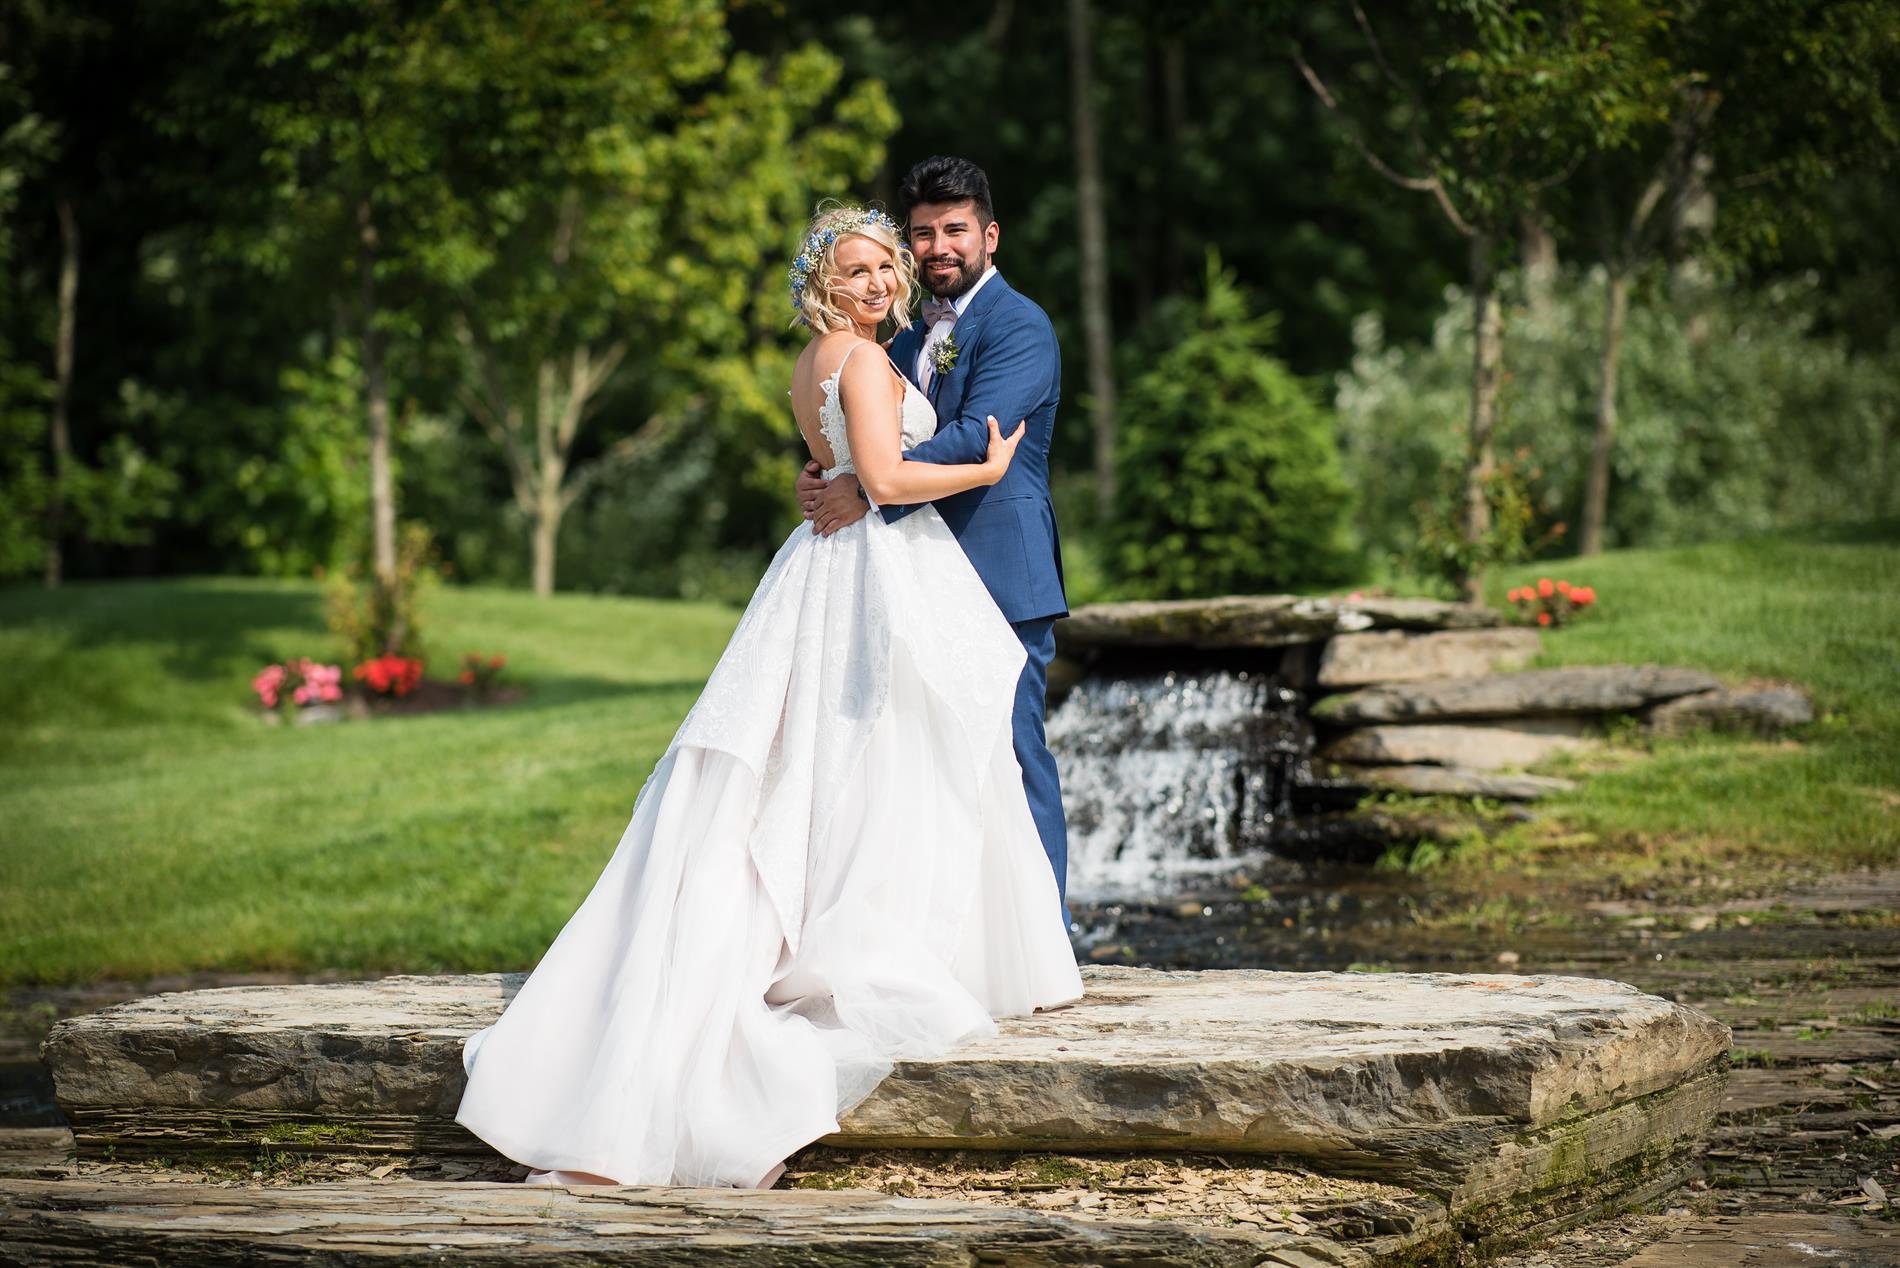 Chelsea & Jon Wedding Photos